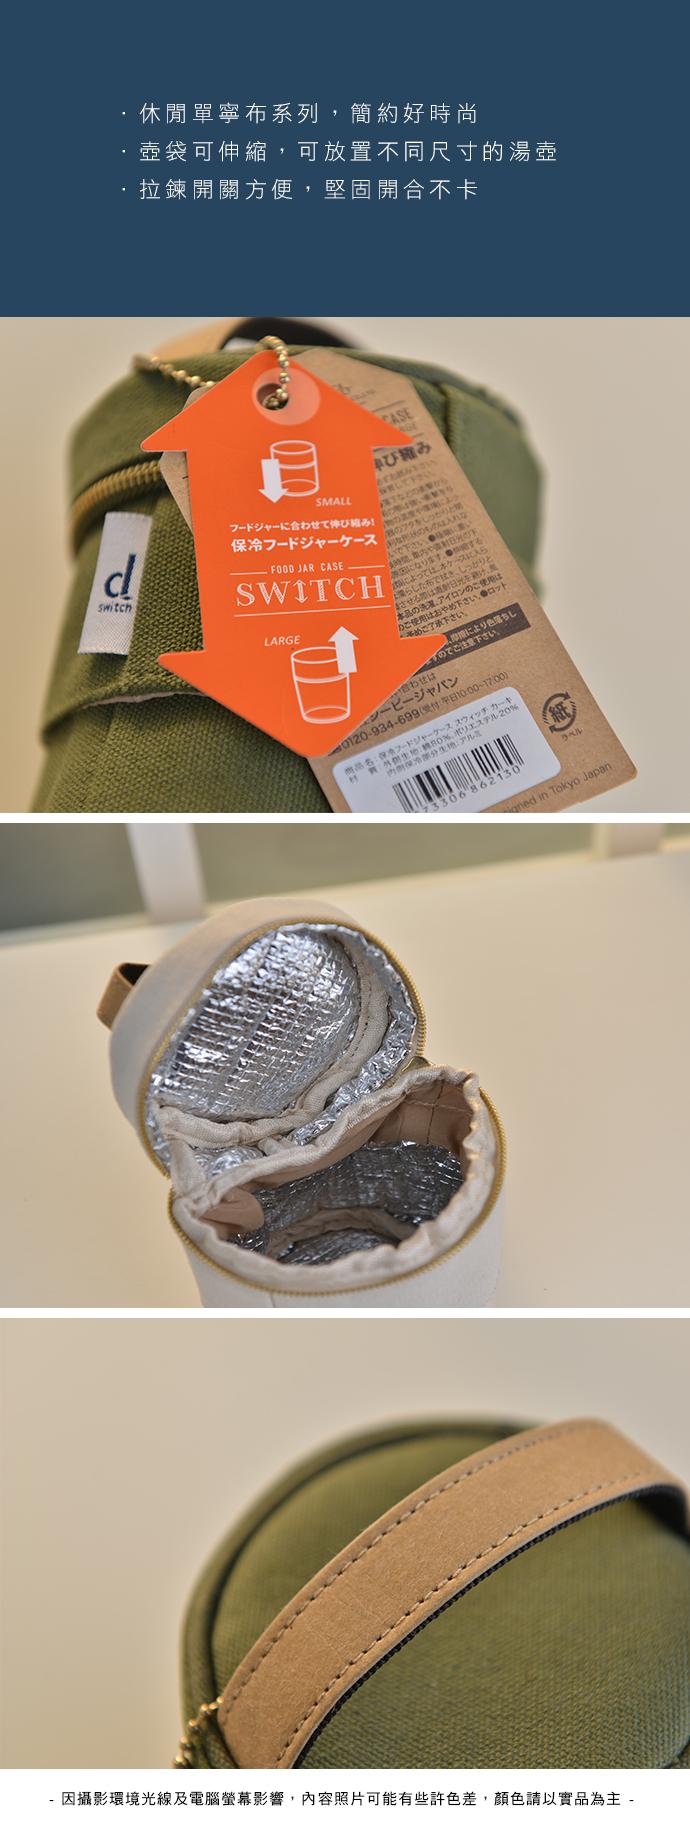 CB Japan 丹寧系列伸縮保冷手提湯袋 - 森林綠